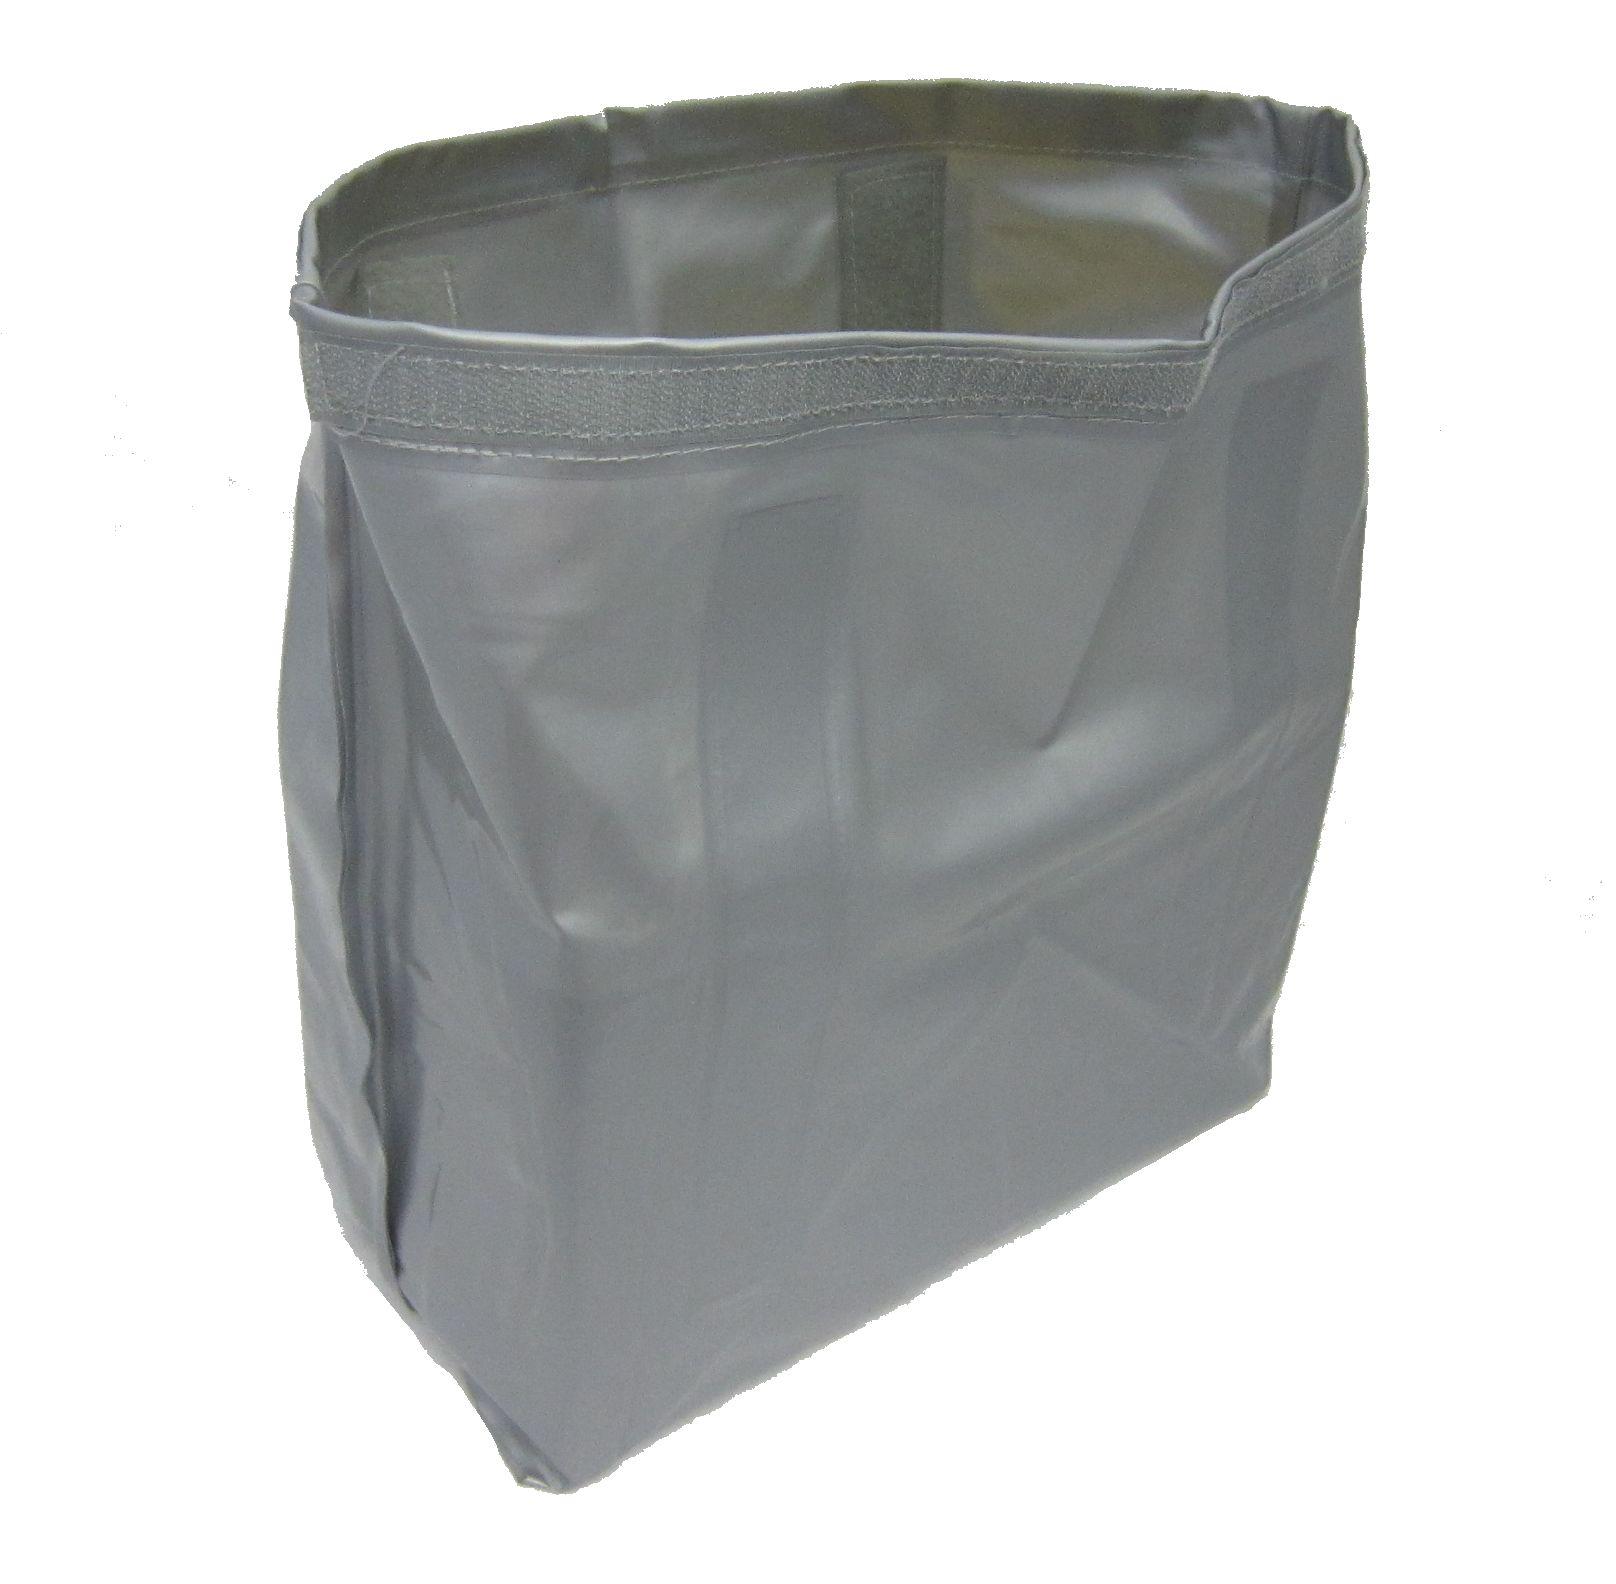 Mountable Cooler Replaceable Liner Bag